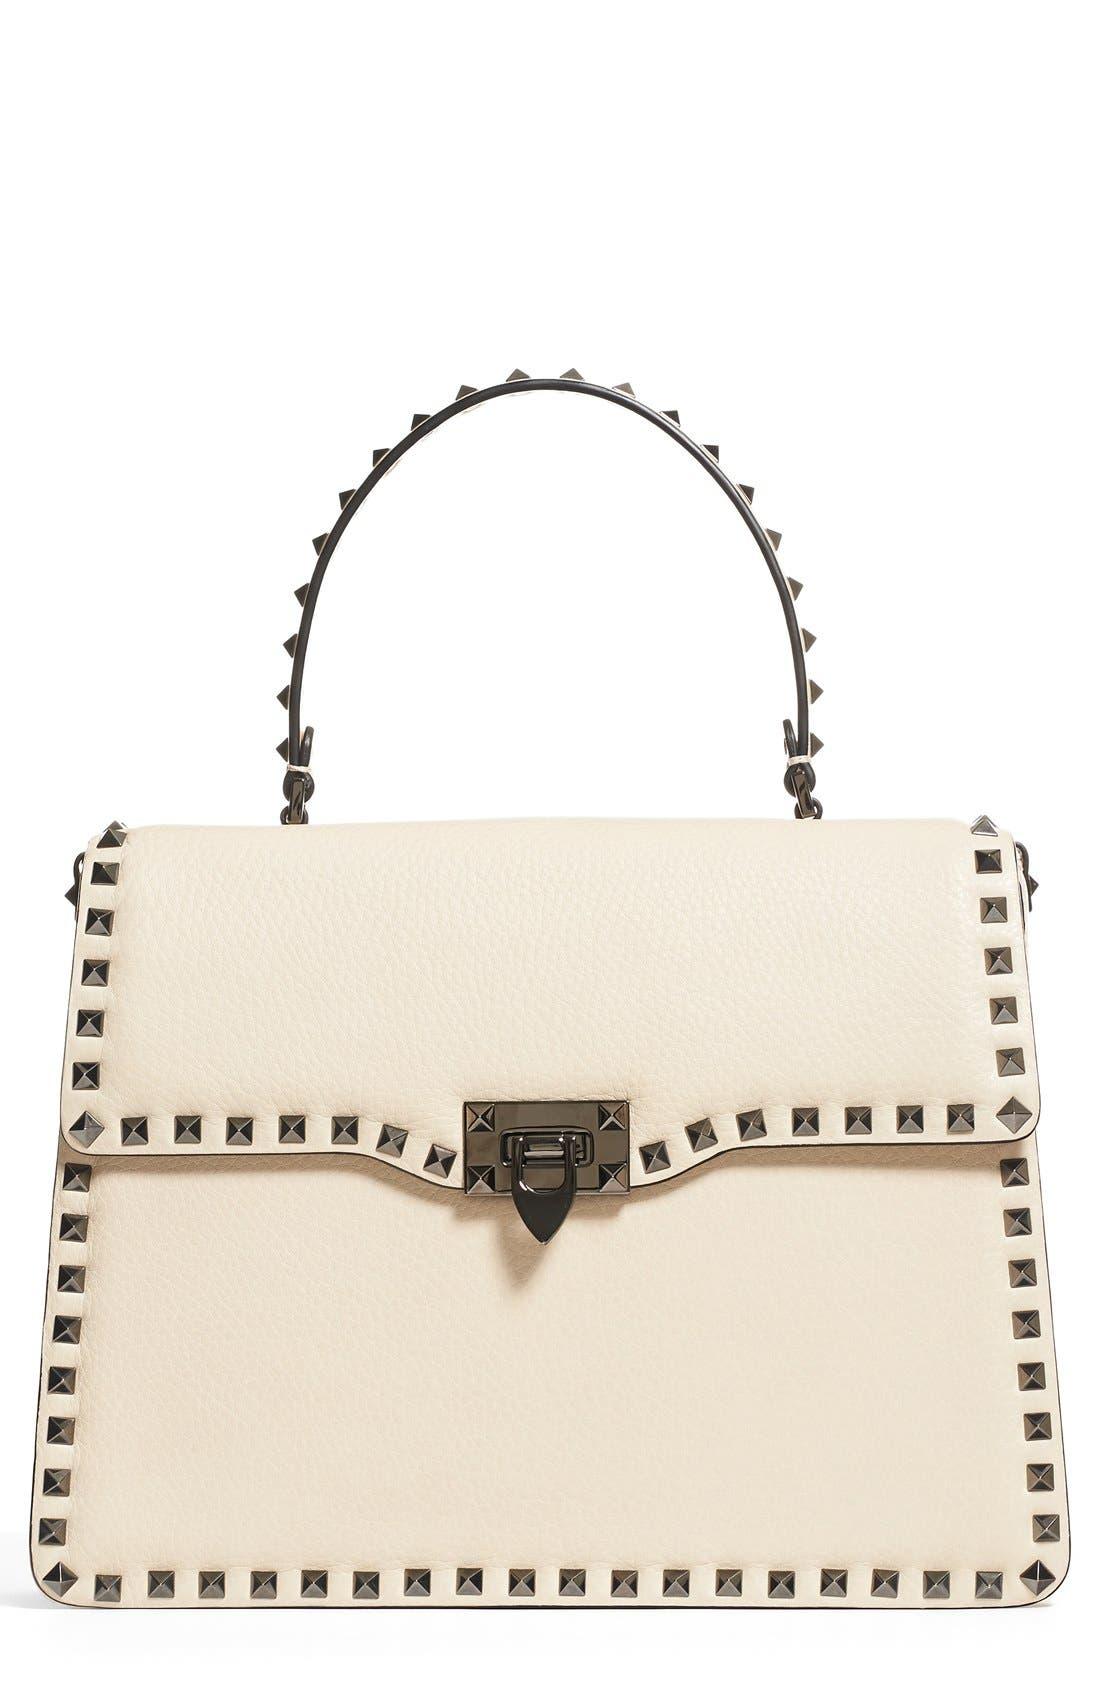 Alternate Image 1 Selected - Valentino Rockstud Framed Leather Handbag